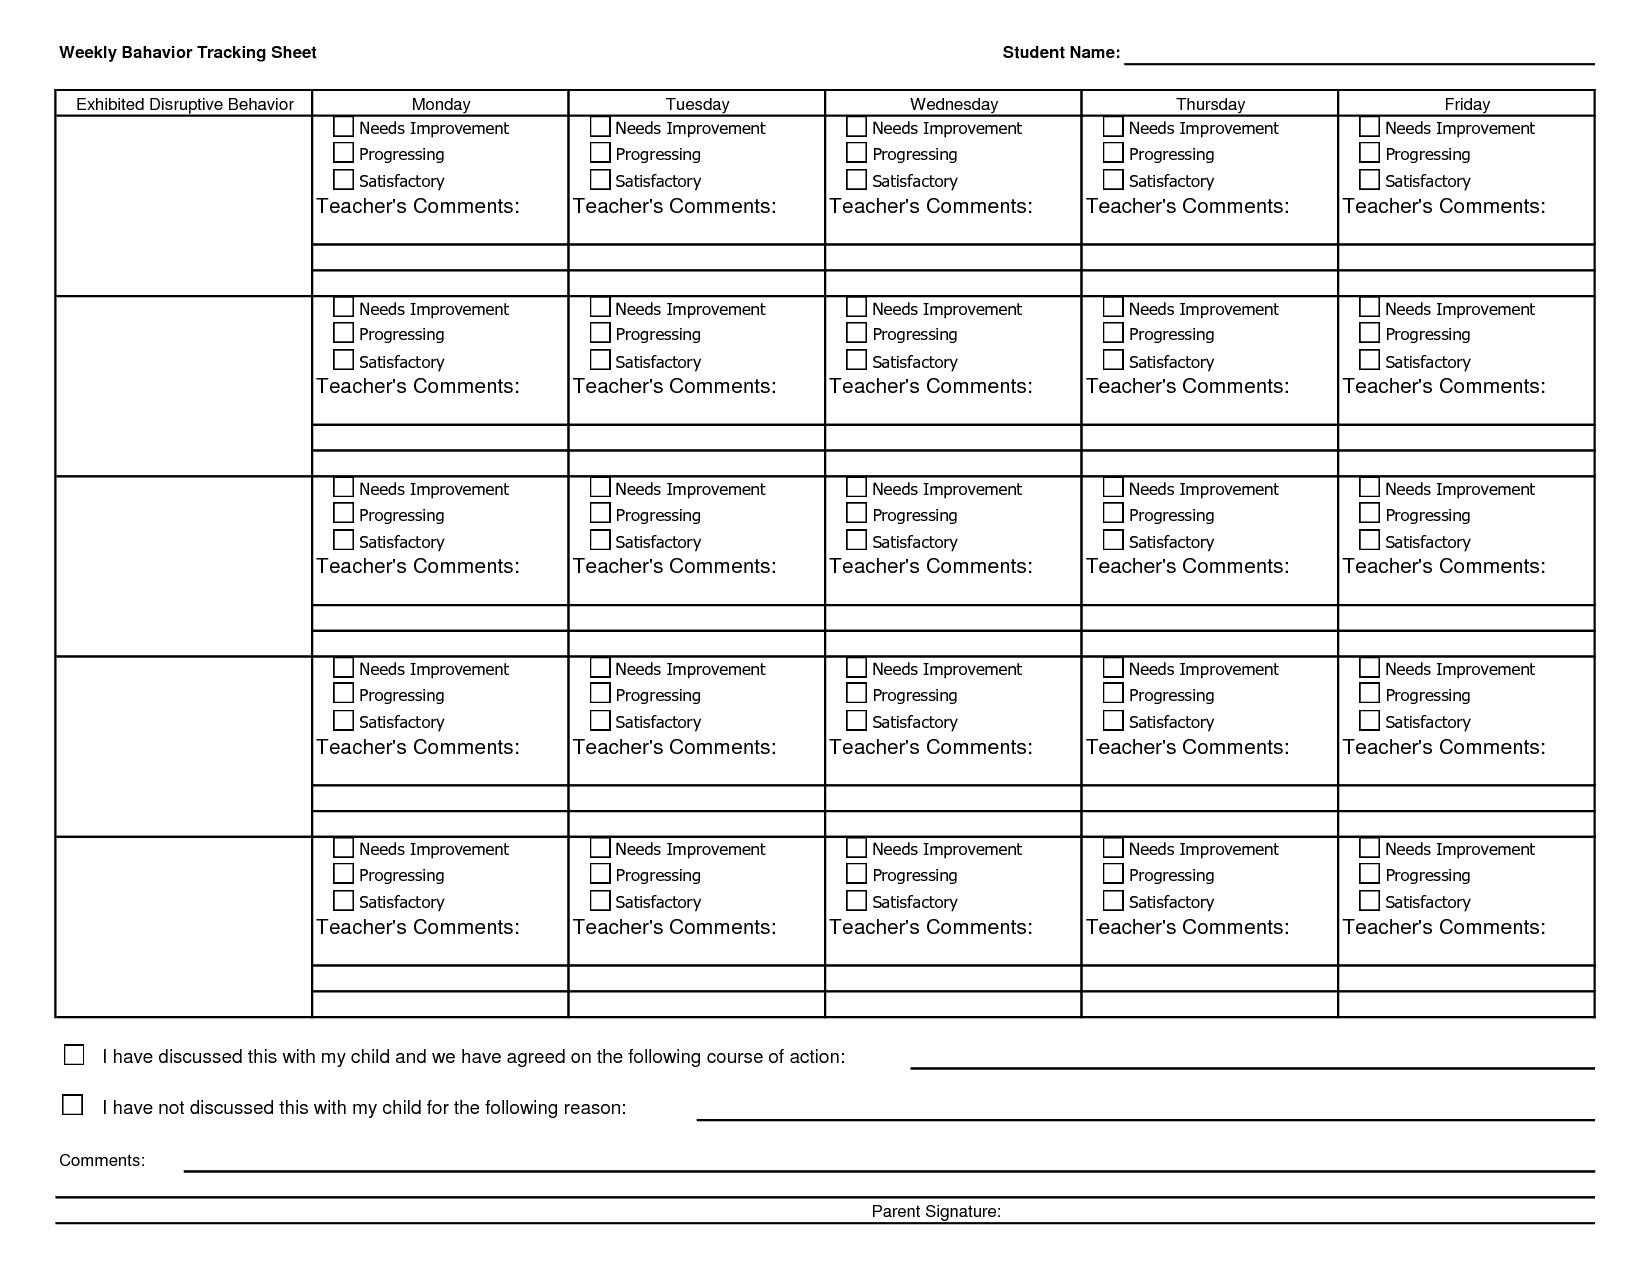 Student Tracking Worksheet